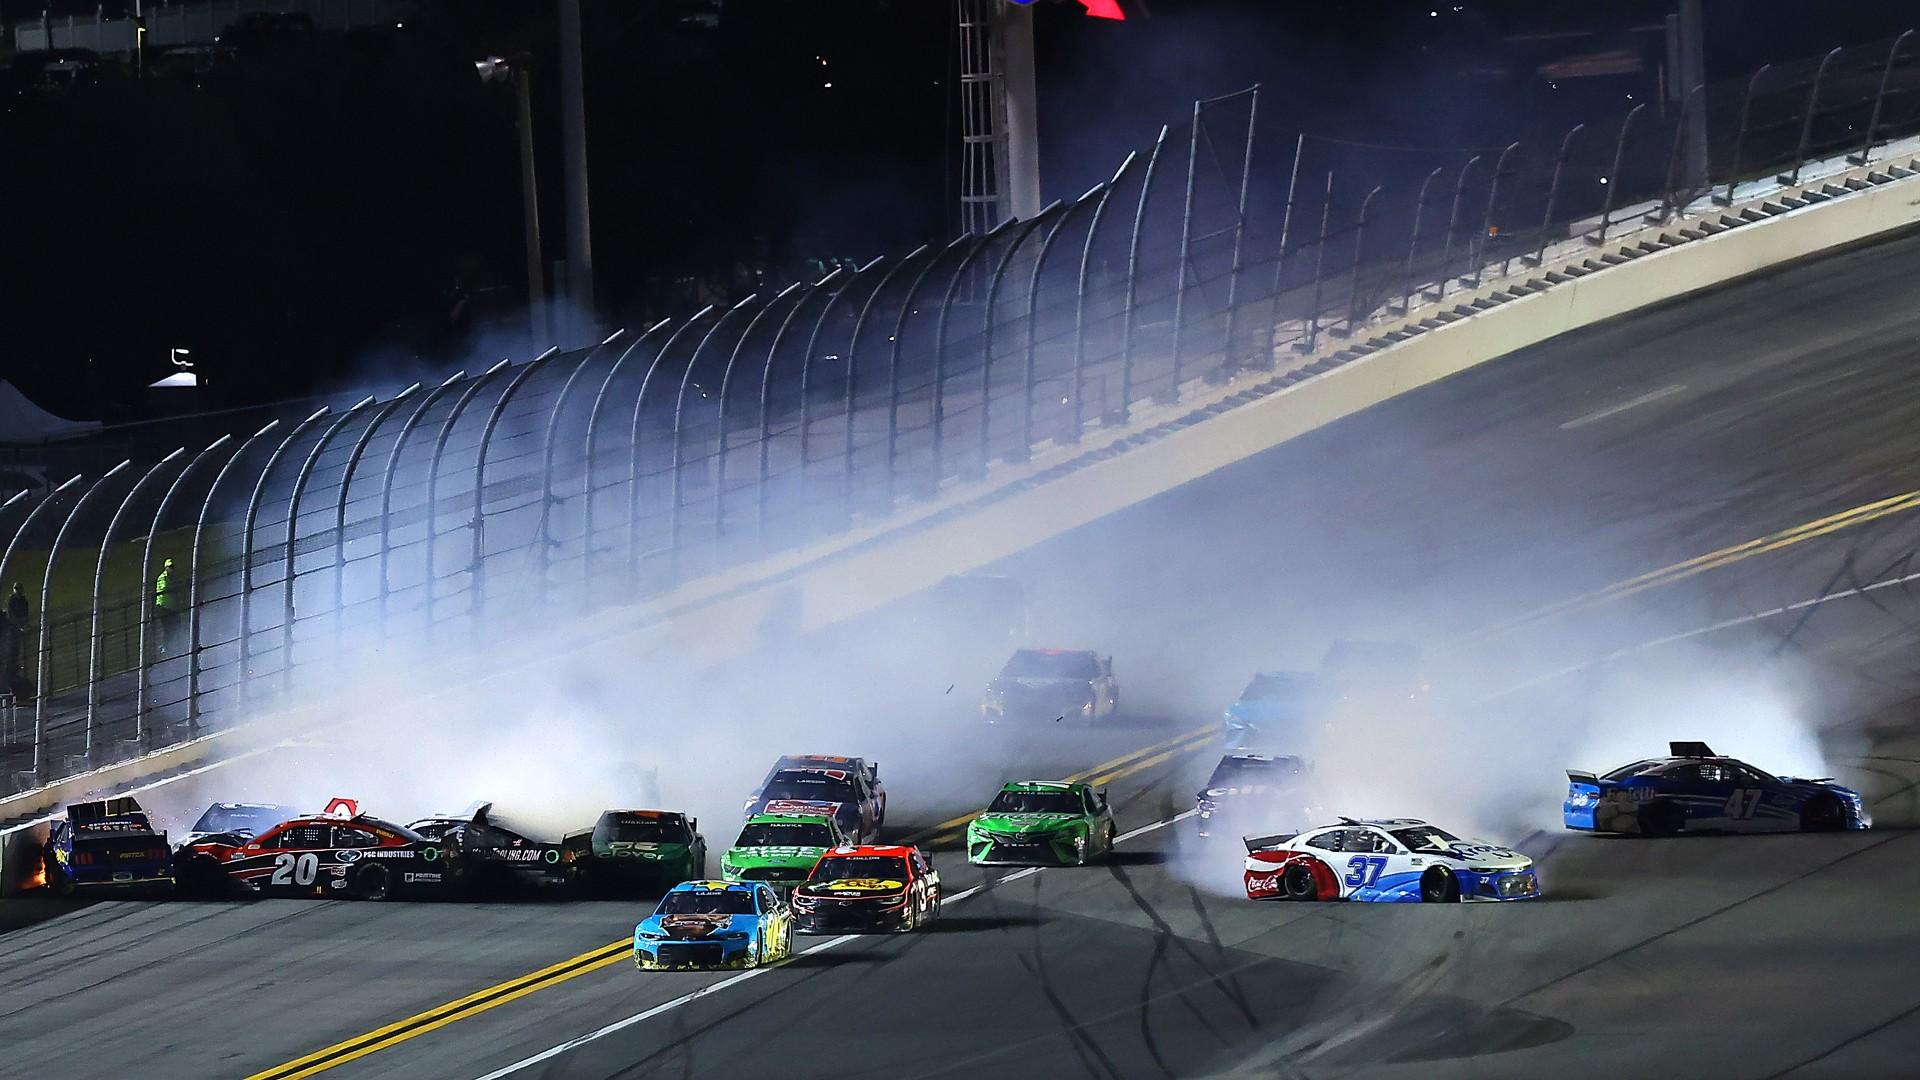 NASCAR at Daytona results: Ryan Blaney wins second straight race in  crash-filled Coke Zero Sugar 400 - REDACAOEMCAMPO